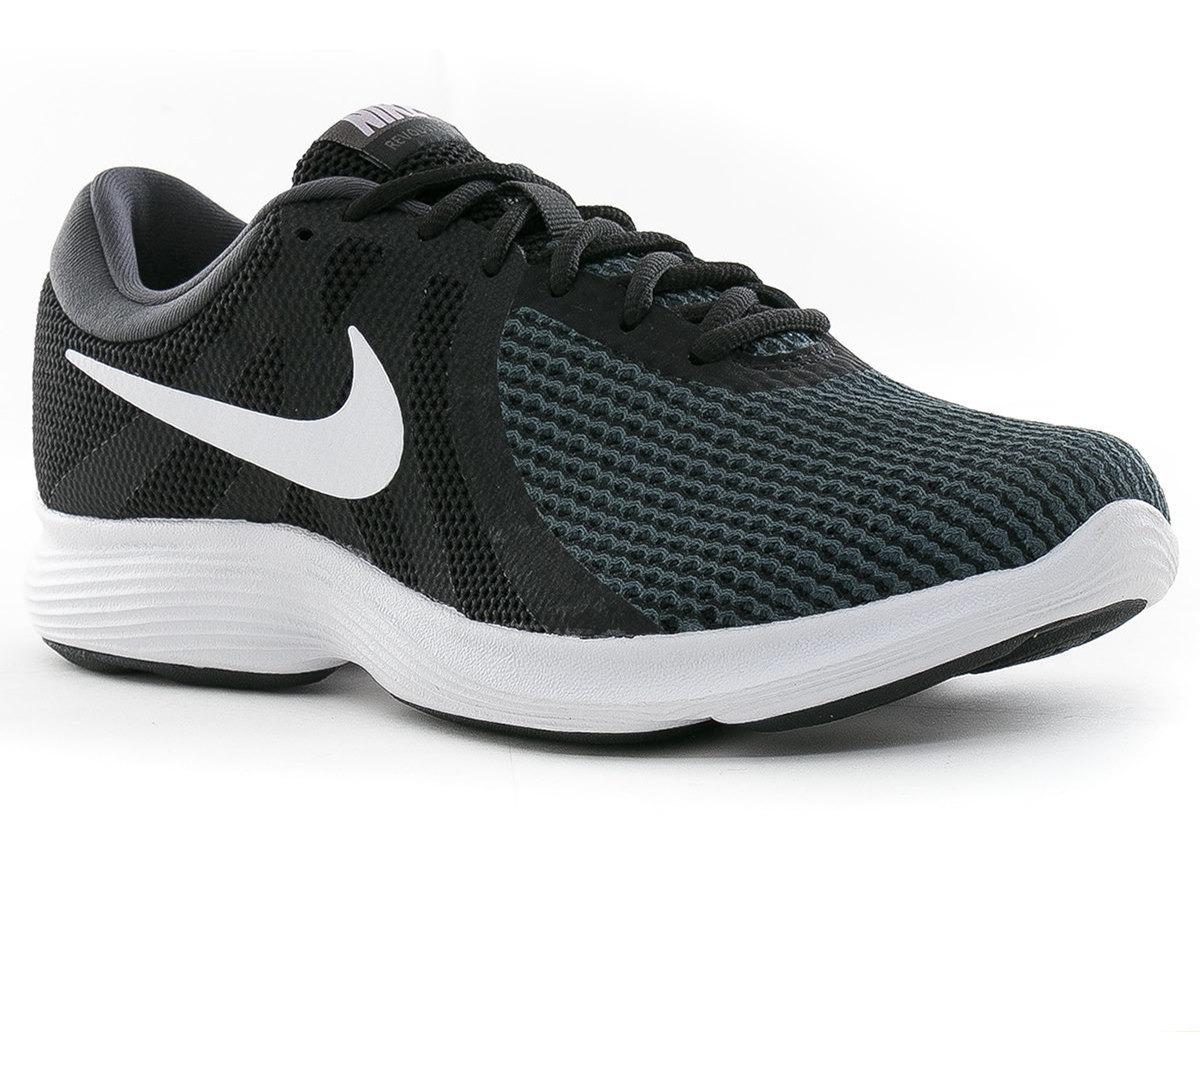 Zapatillas Revolution 4 Nike Sport 78 Tienda Oficial